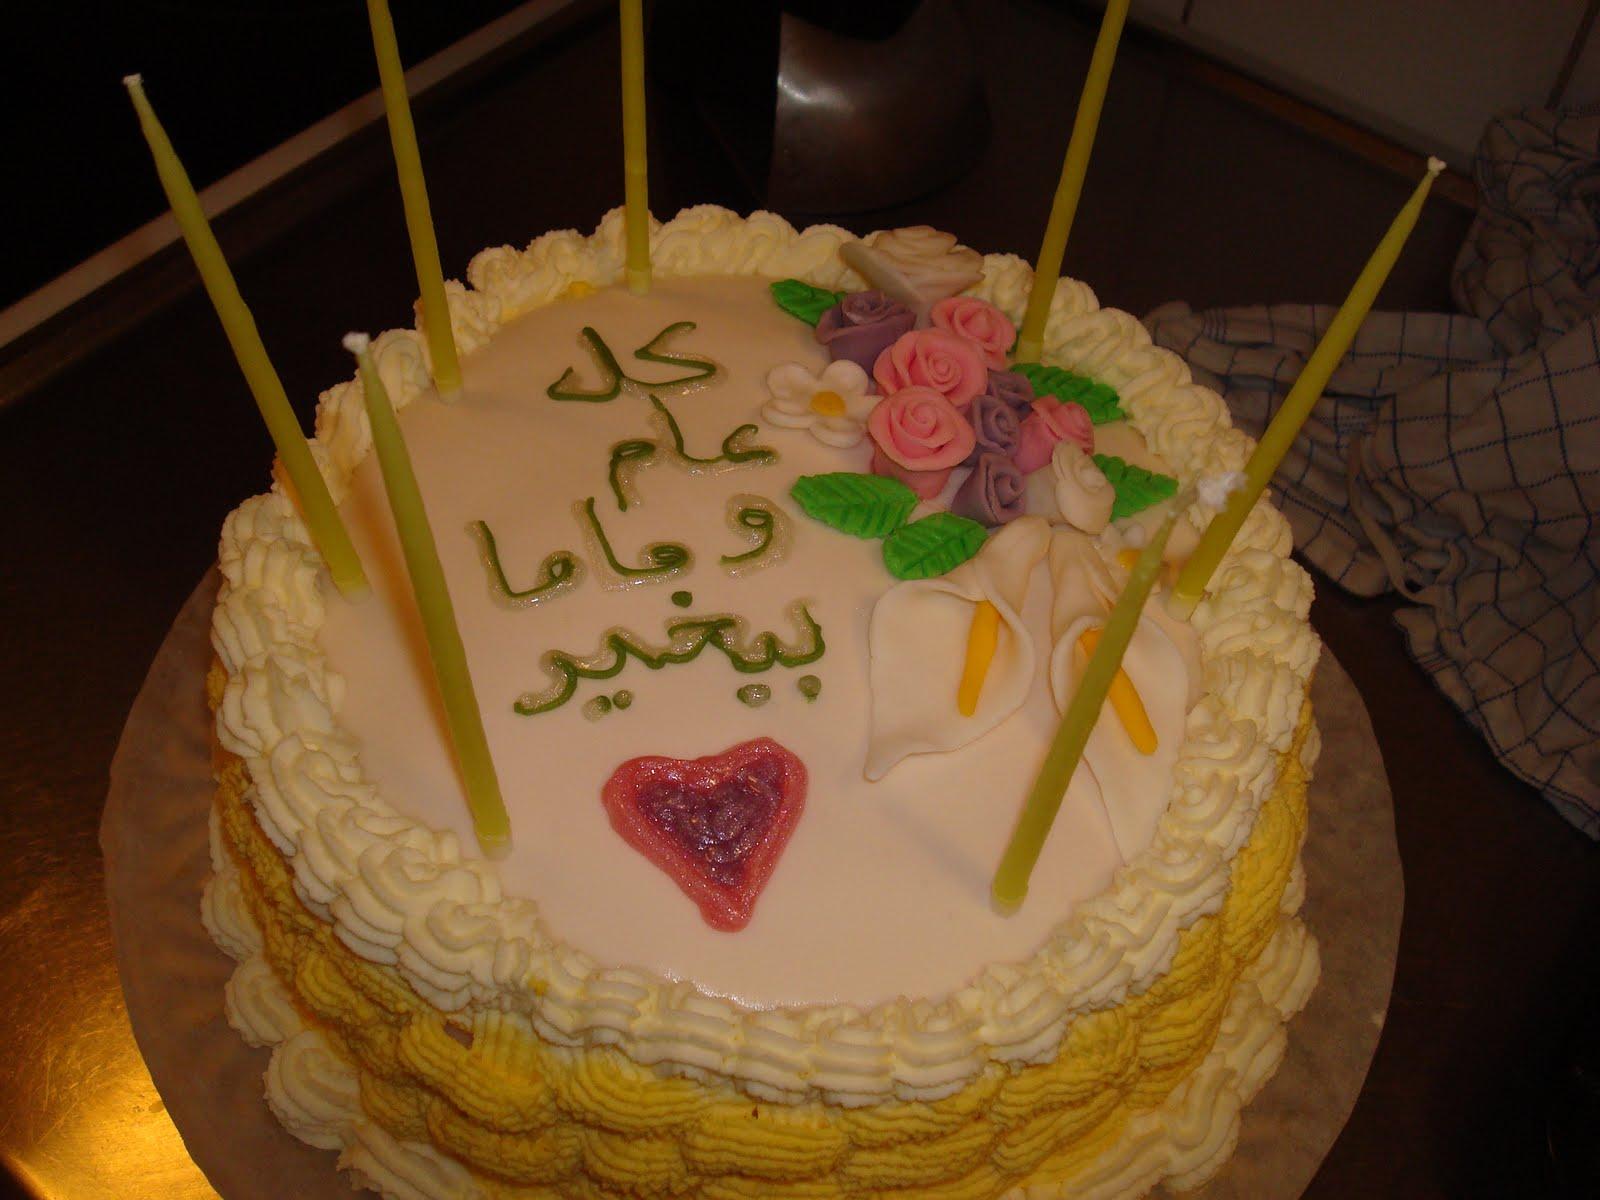 grattis på arabiska Sallys Dreamcakes: Arabisk morsdag tårta grattis på arabiska